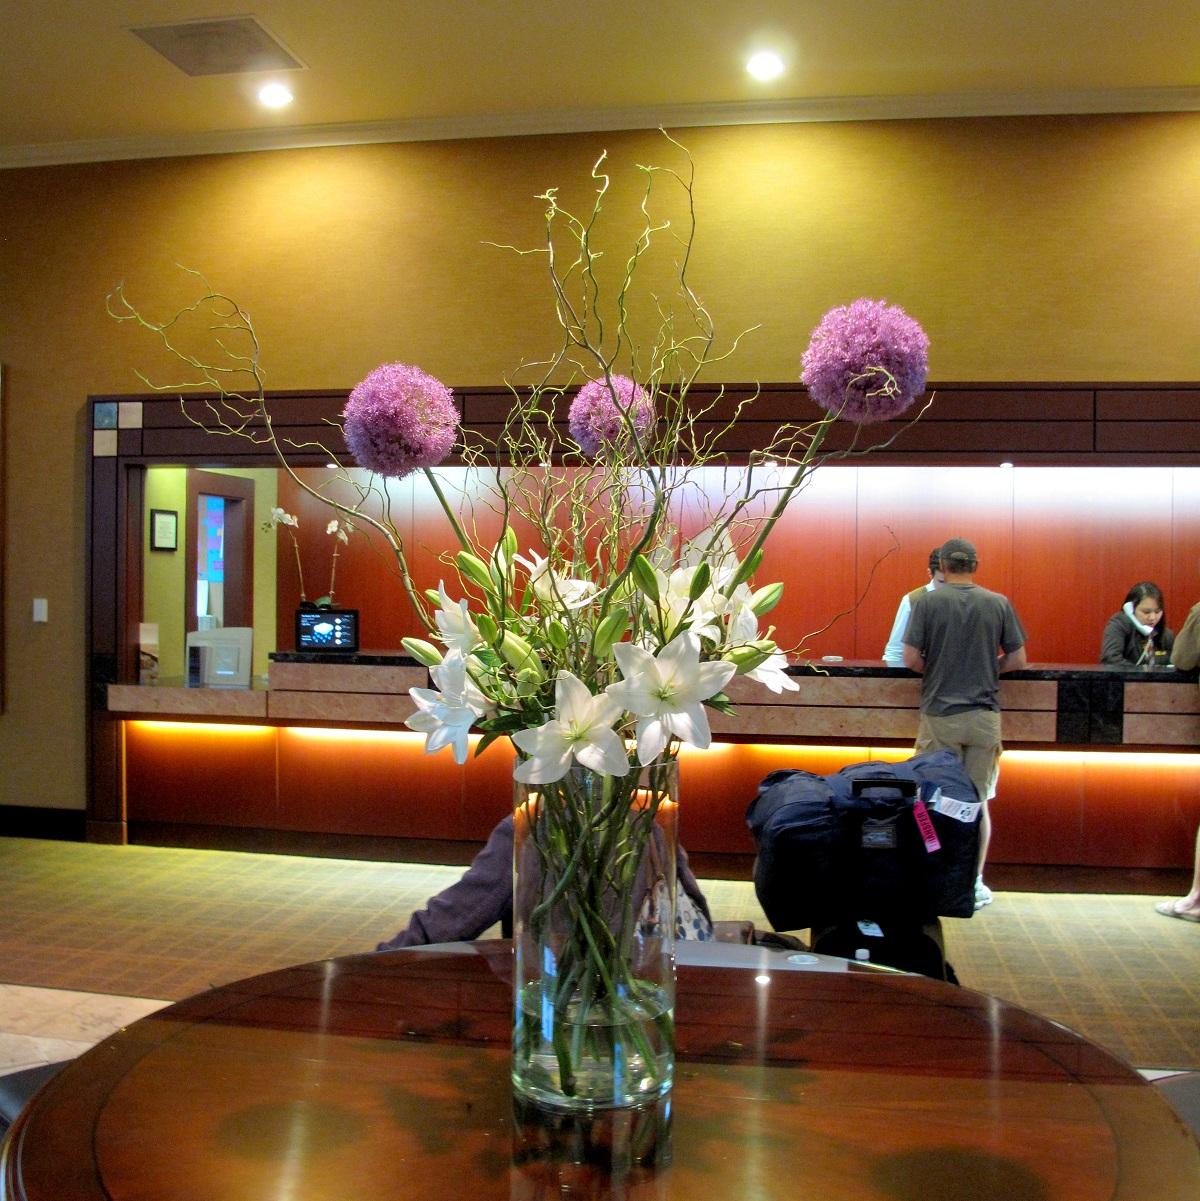 Hotel Foyer Flowers : Flower arrangements gallery floral sunshine